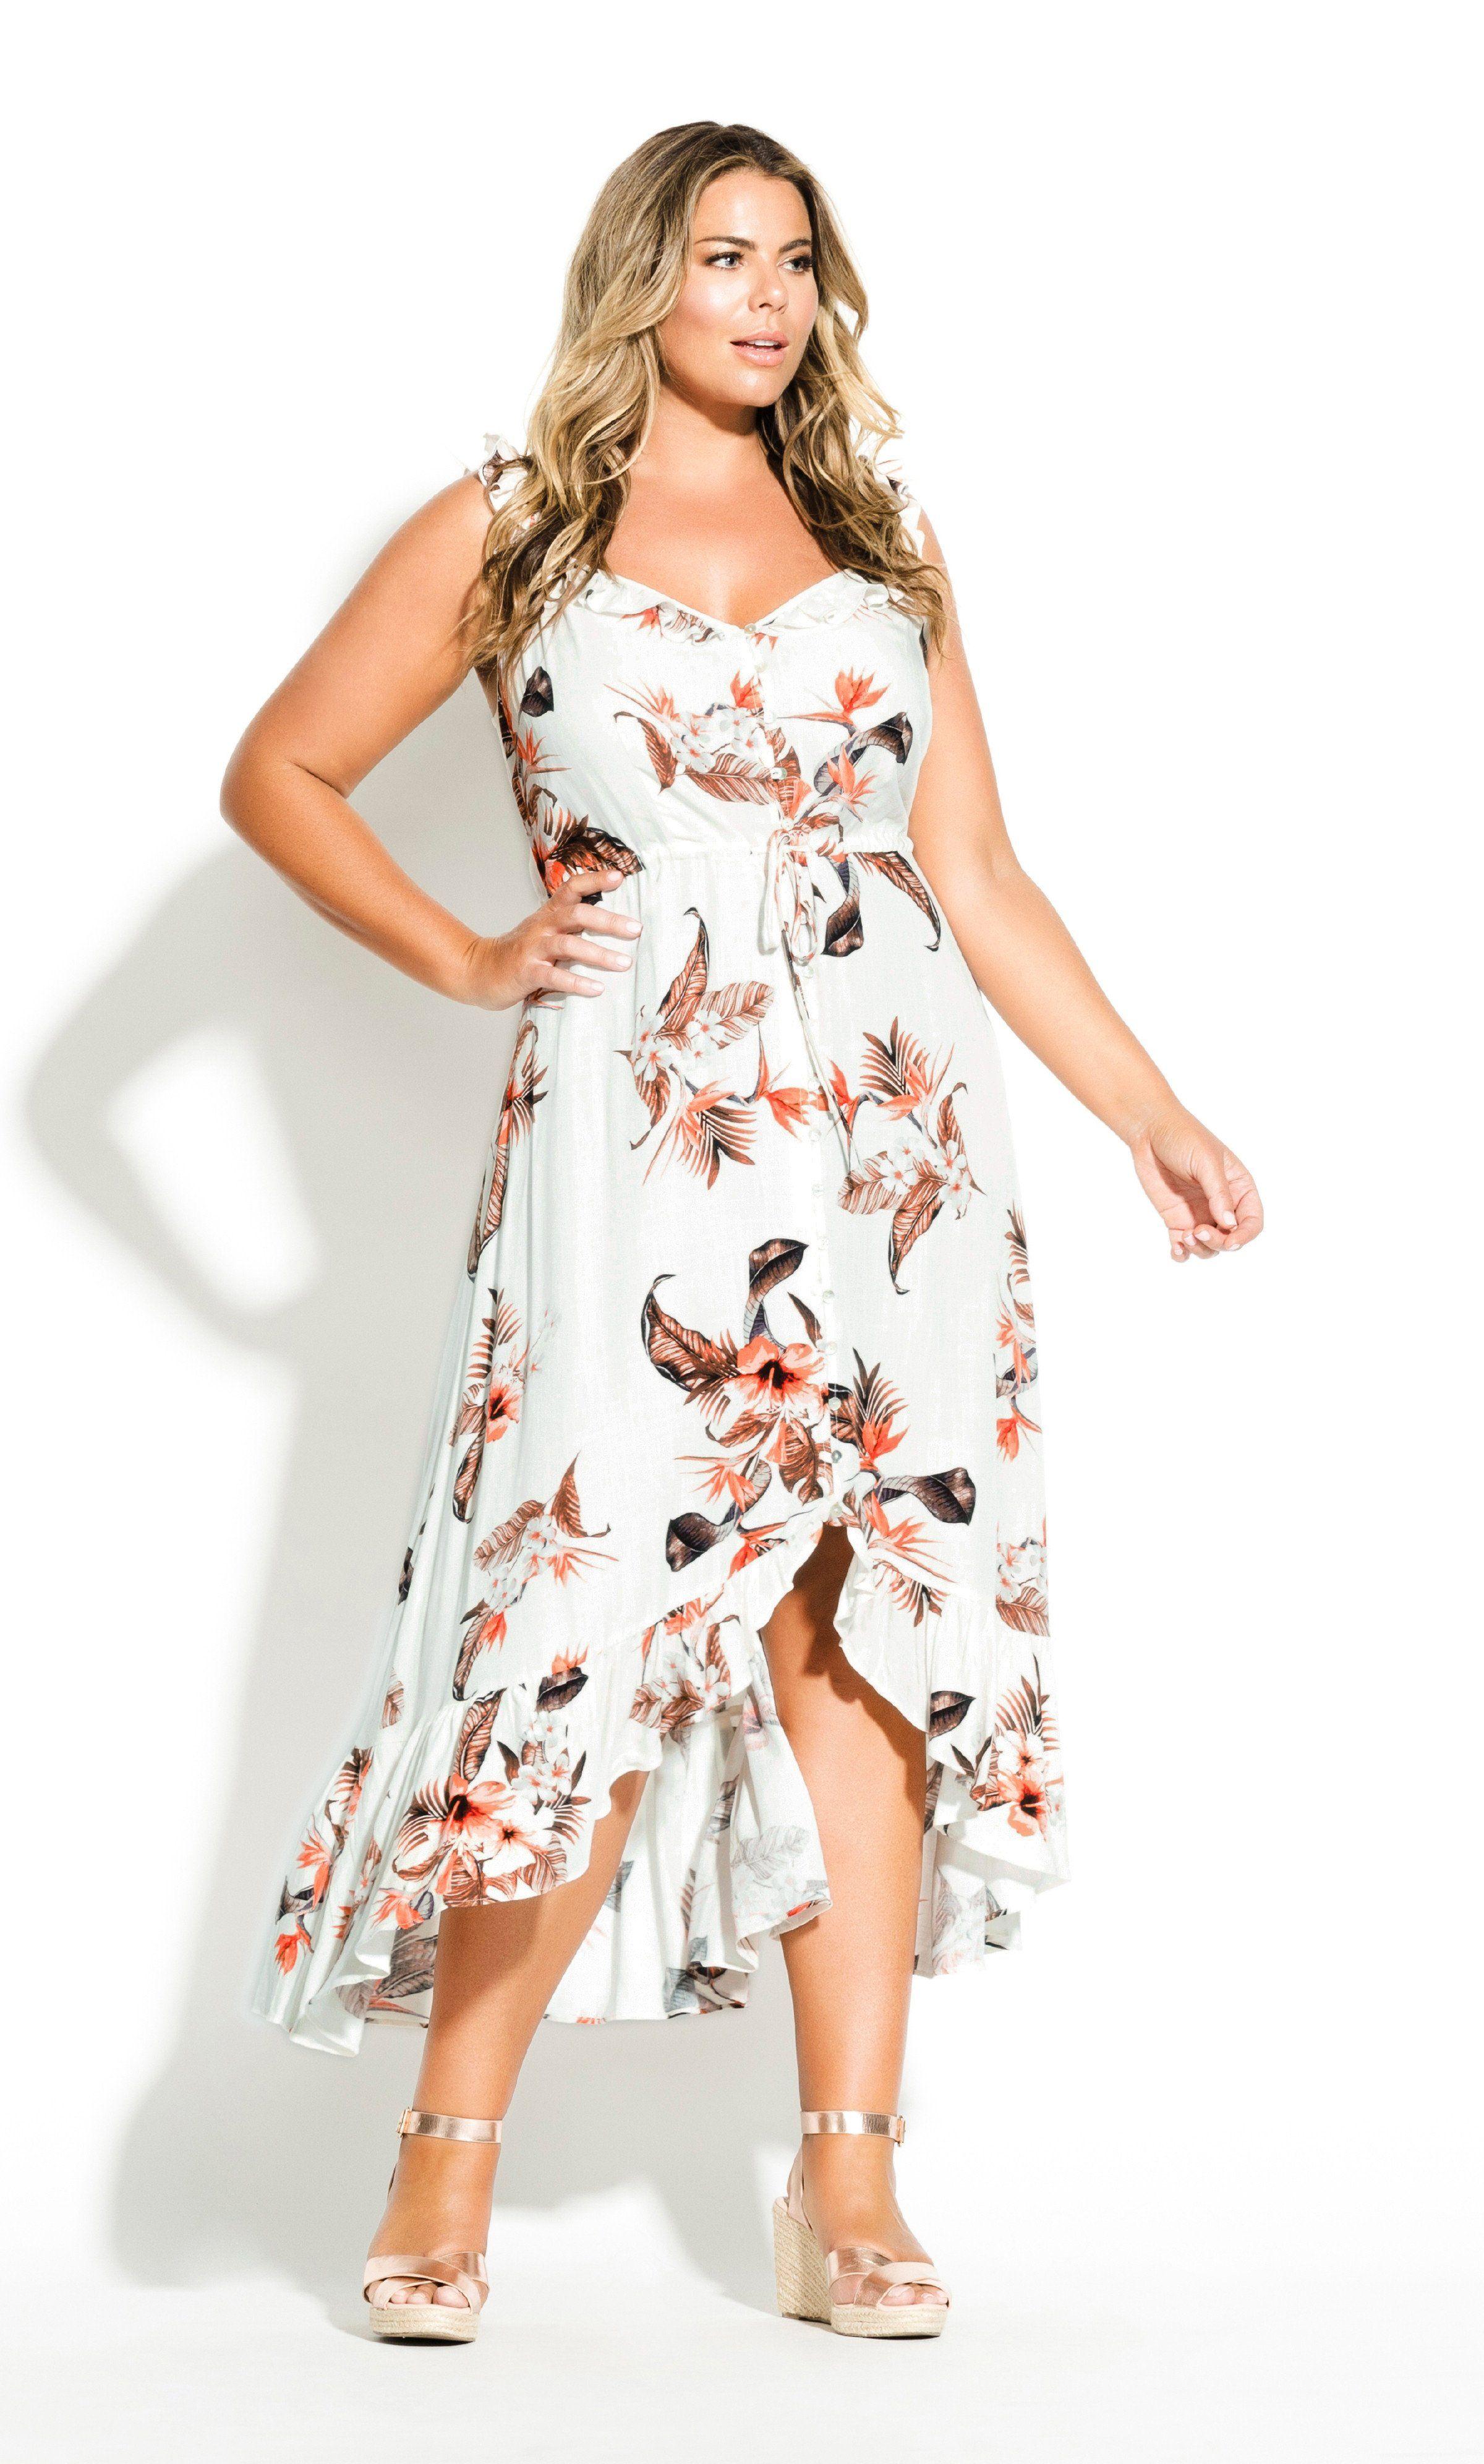 Seville Fashion: Plus Size Fashion, Dress For